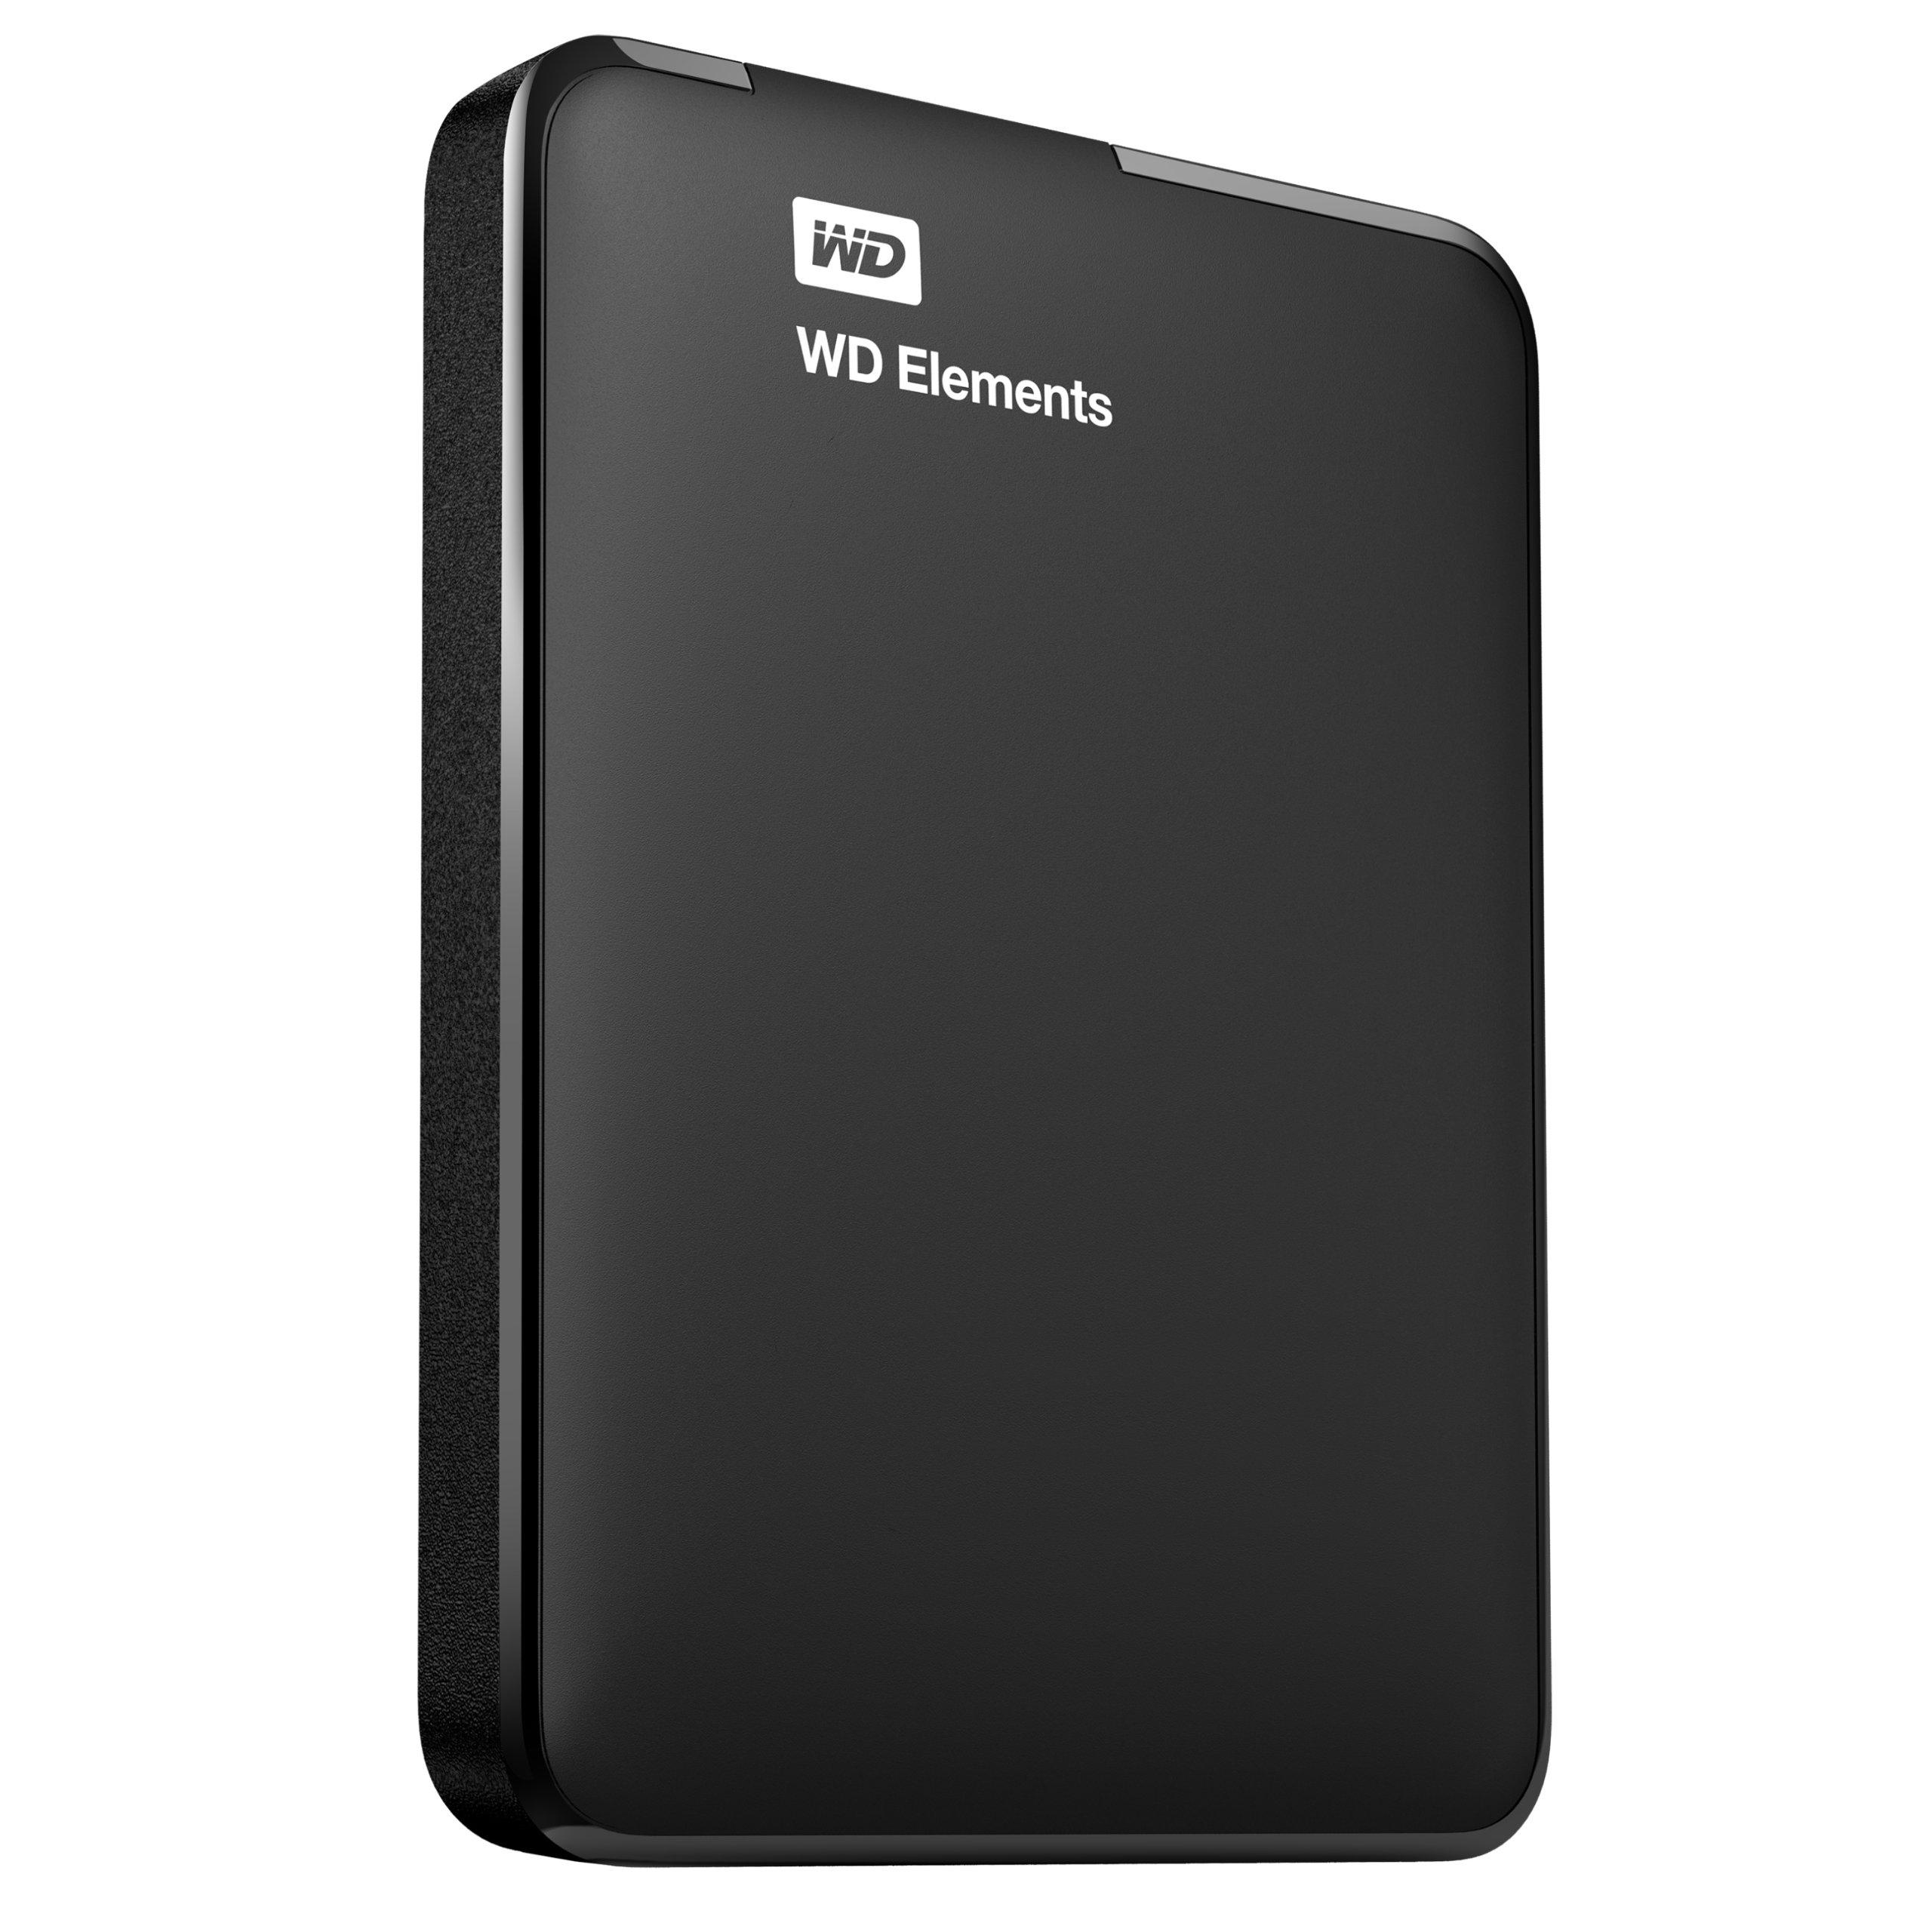 WD Elements 2TB USB 3.0 Portable External Hard Drive (Black) product image